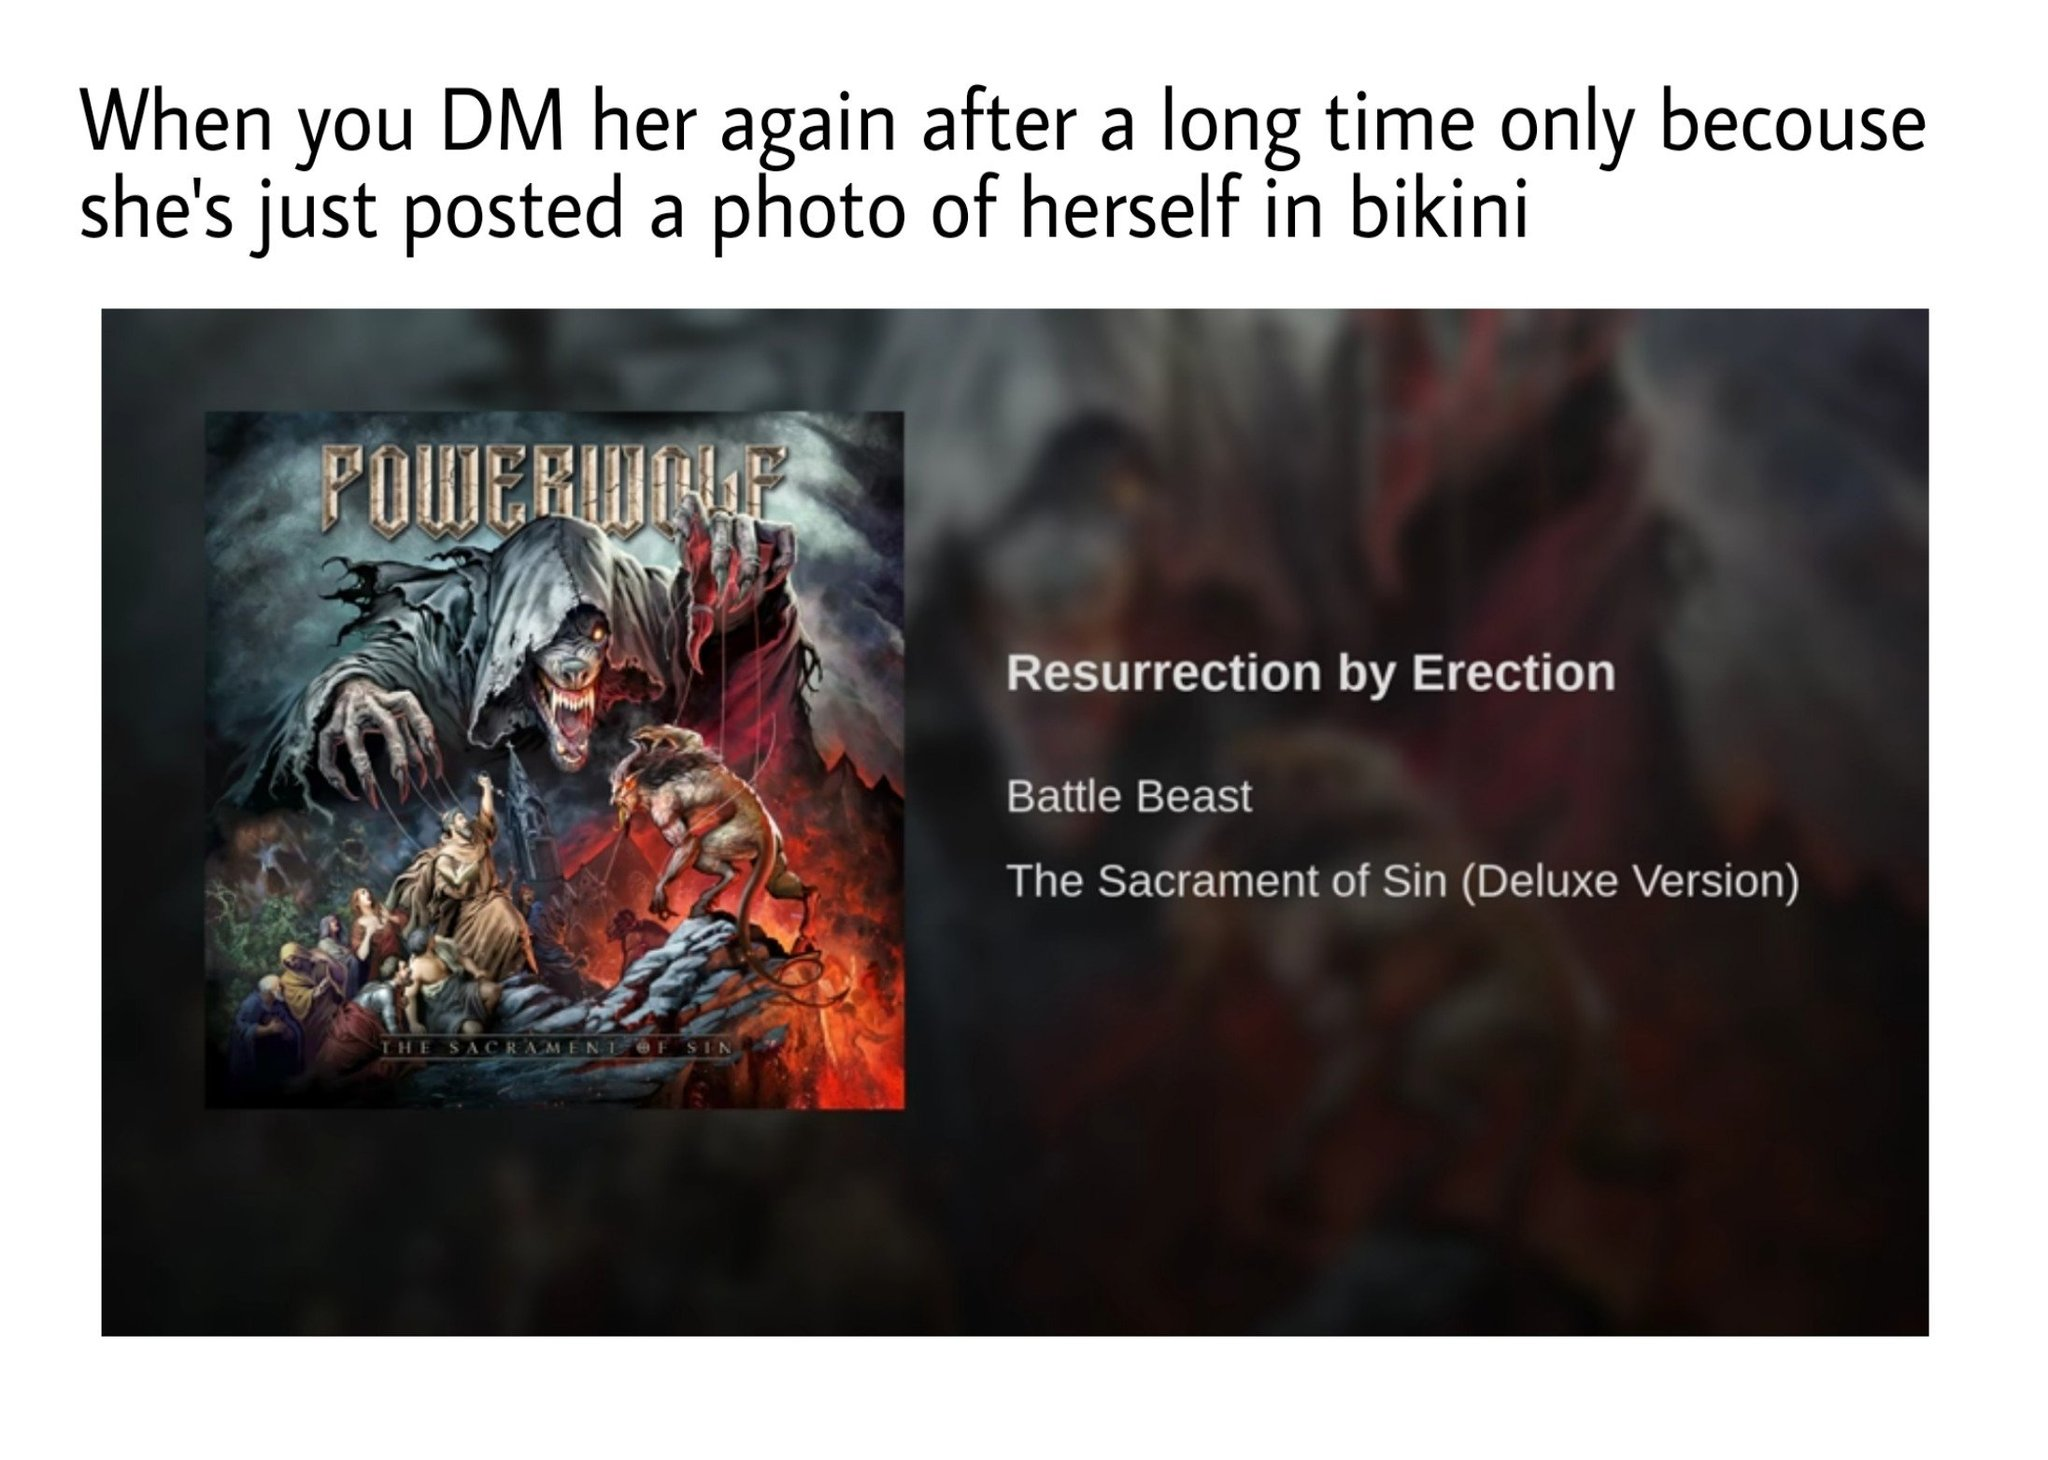 RESURRECTION BY ERECTION - meme